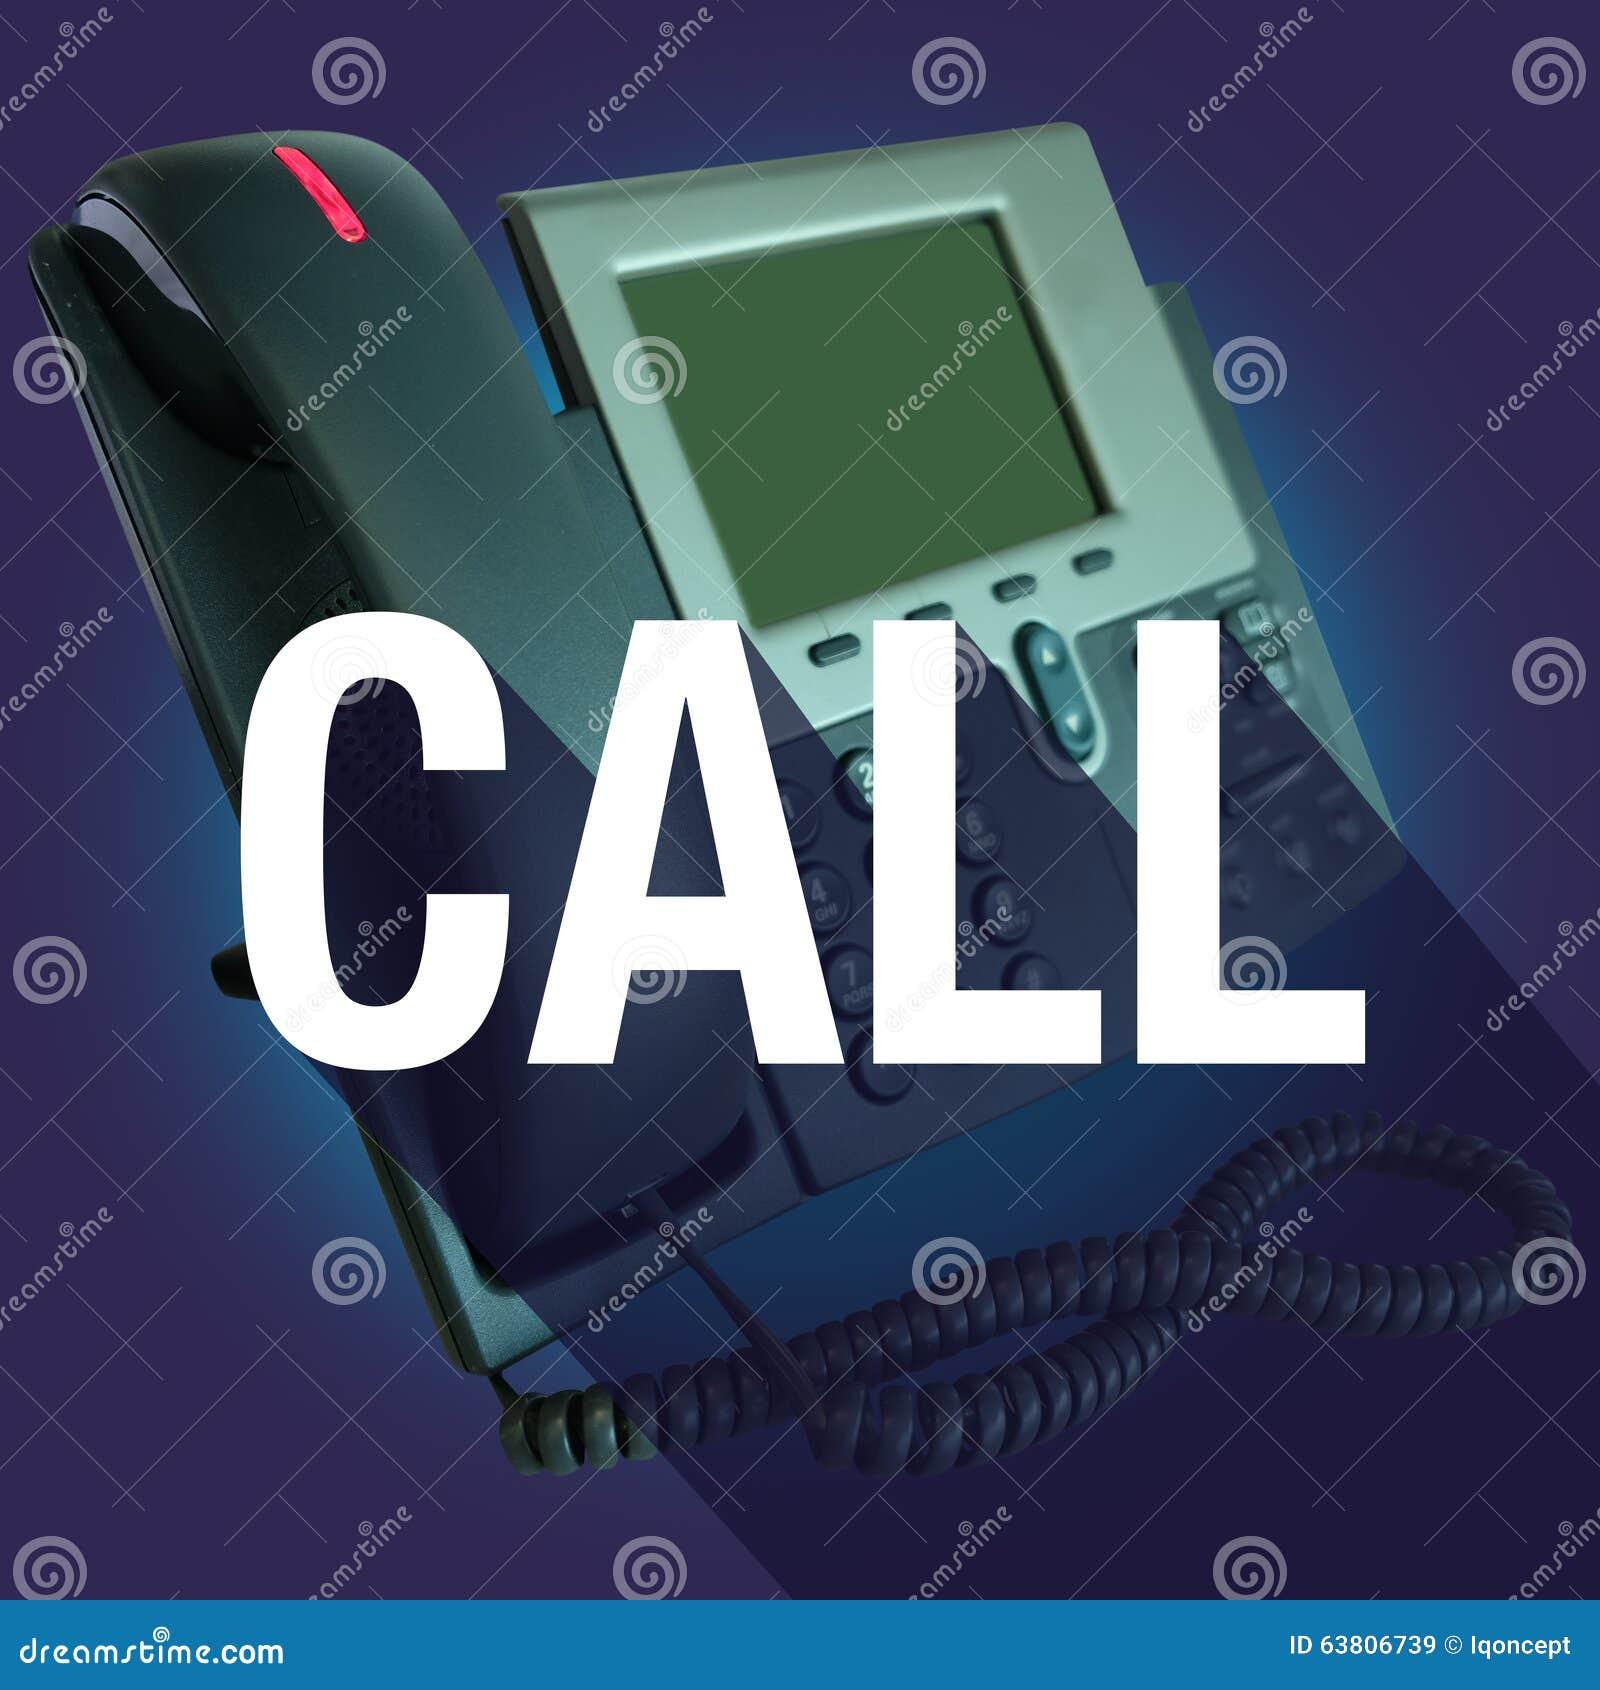 Call teen help hotline